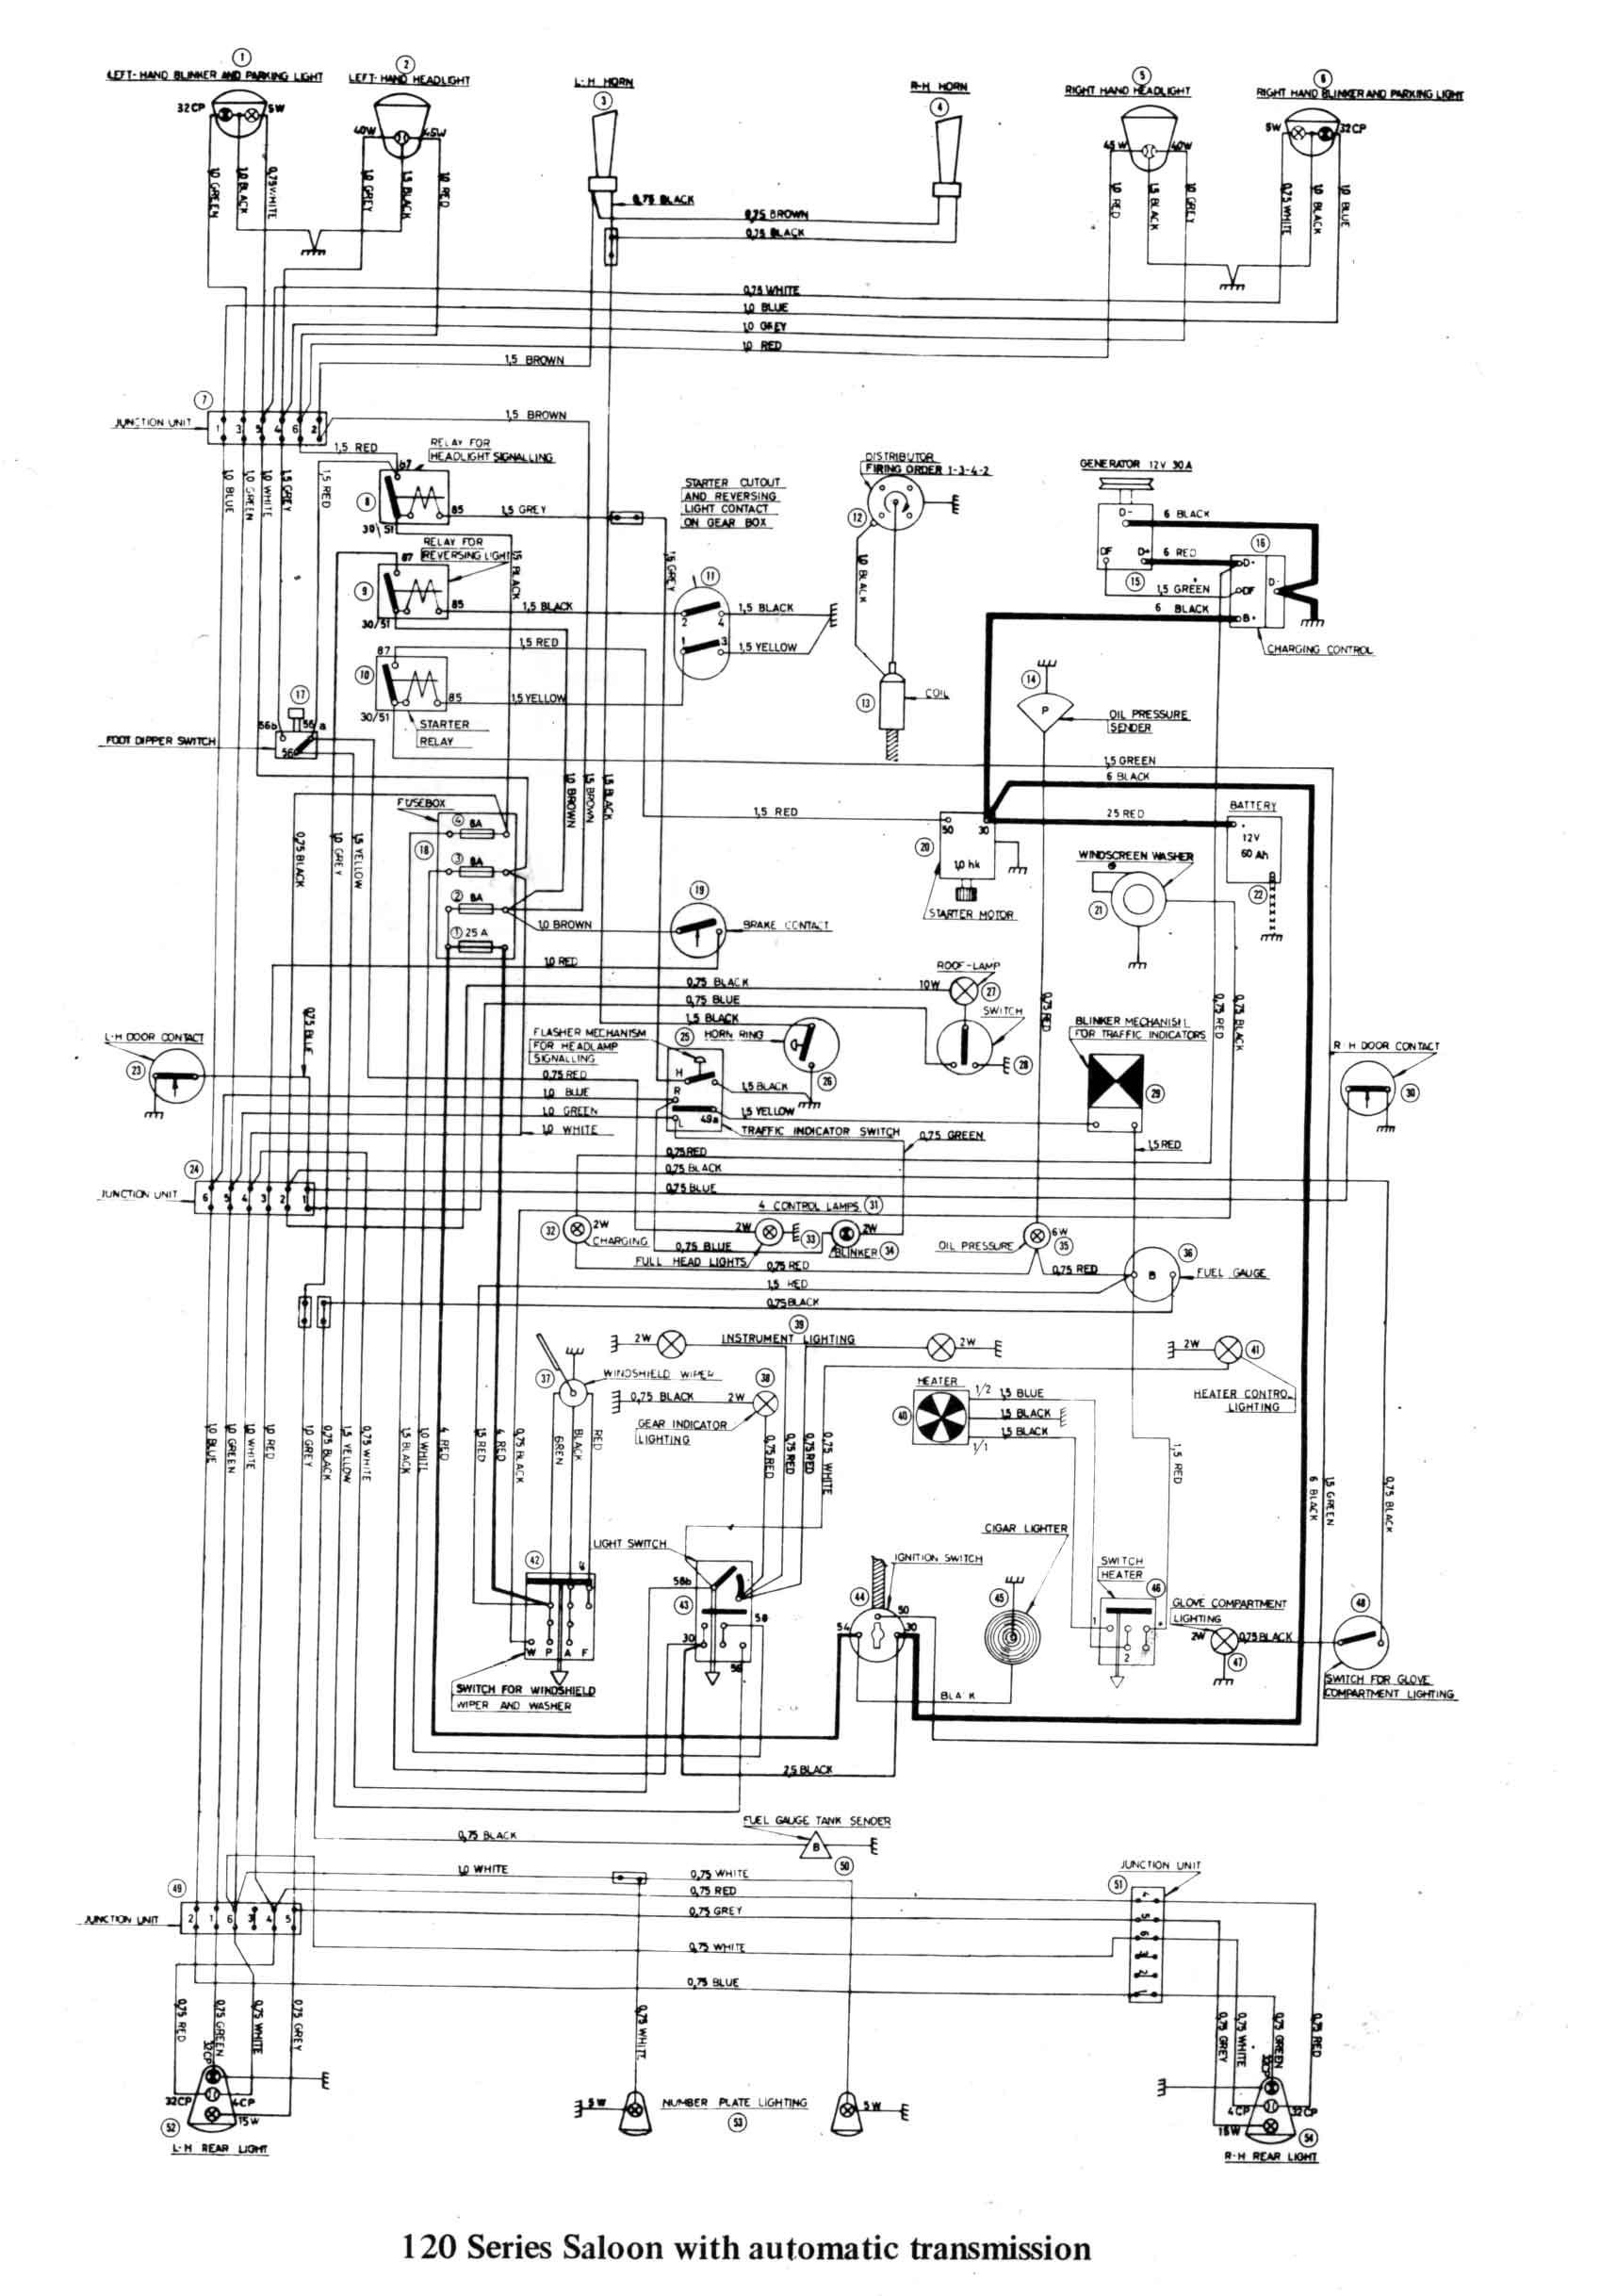 Brilliant 1994 Ktm Wiring Diagram Basic Electronics Wiring Diagram Wiring Cloud Mousmenurrecoveryedborg